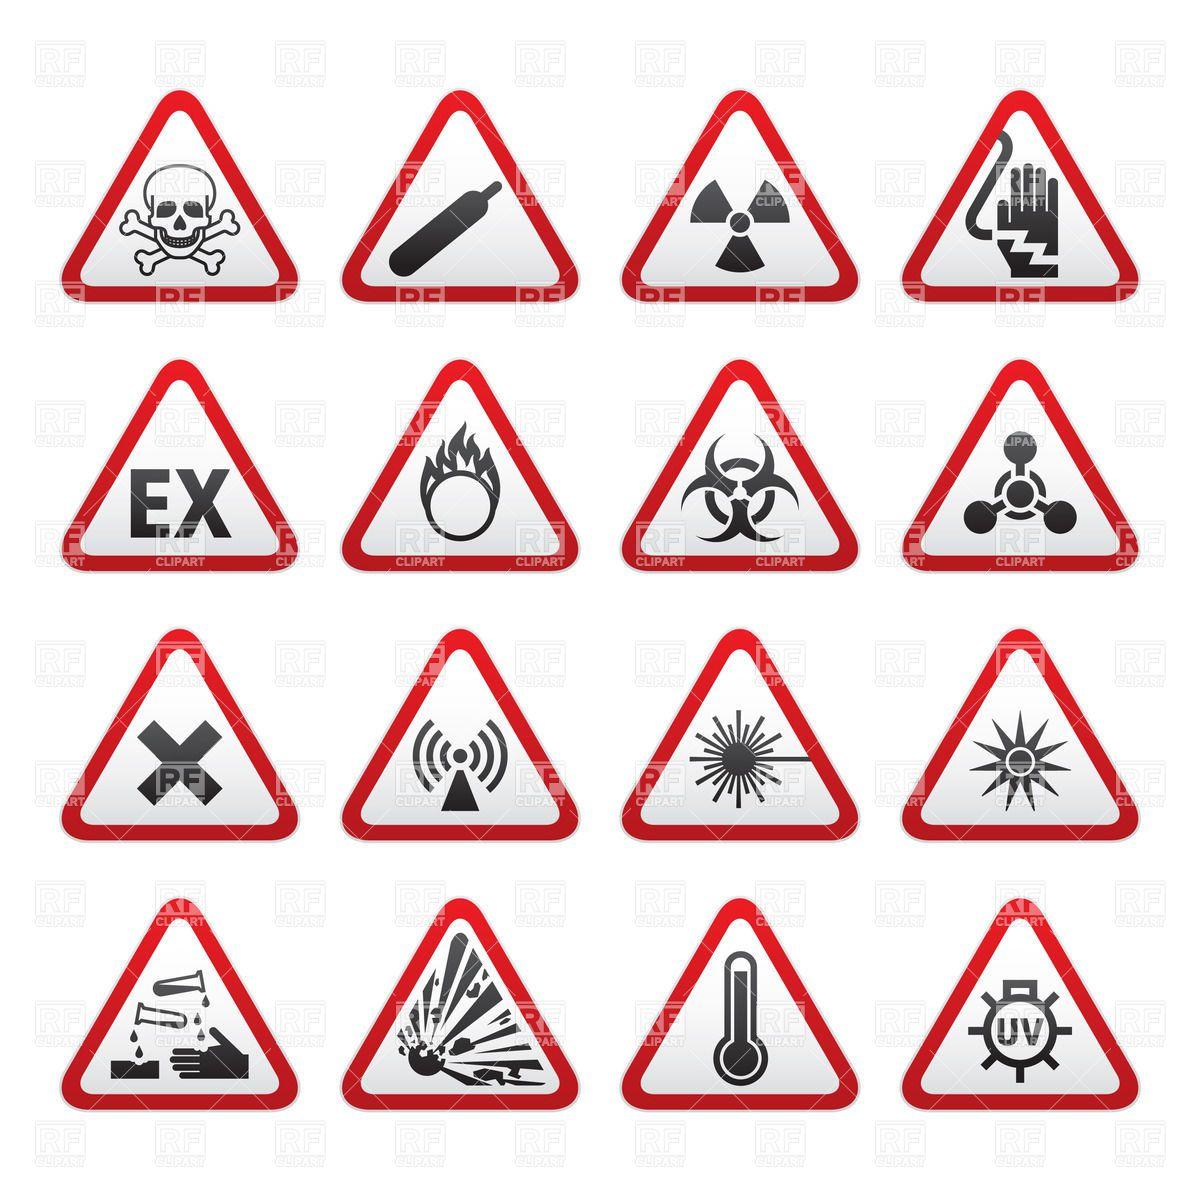 Triangular warning hazard signs Stock Vector Image.